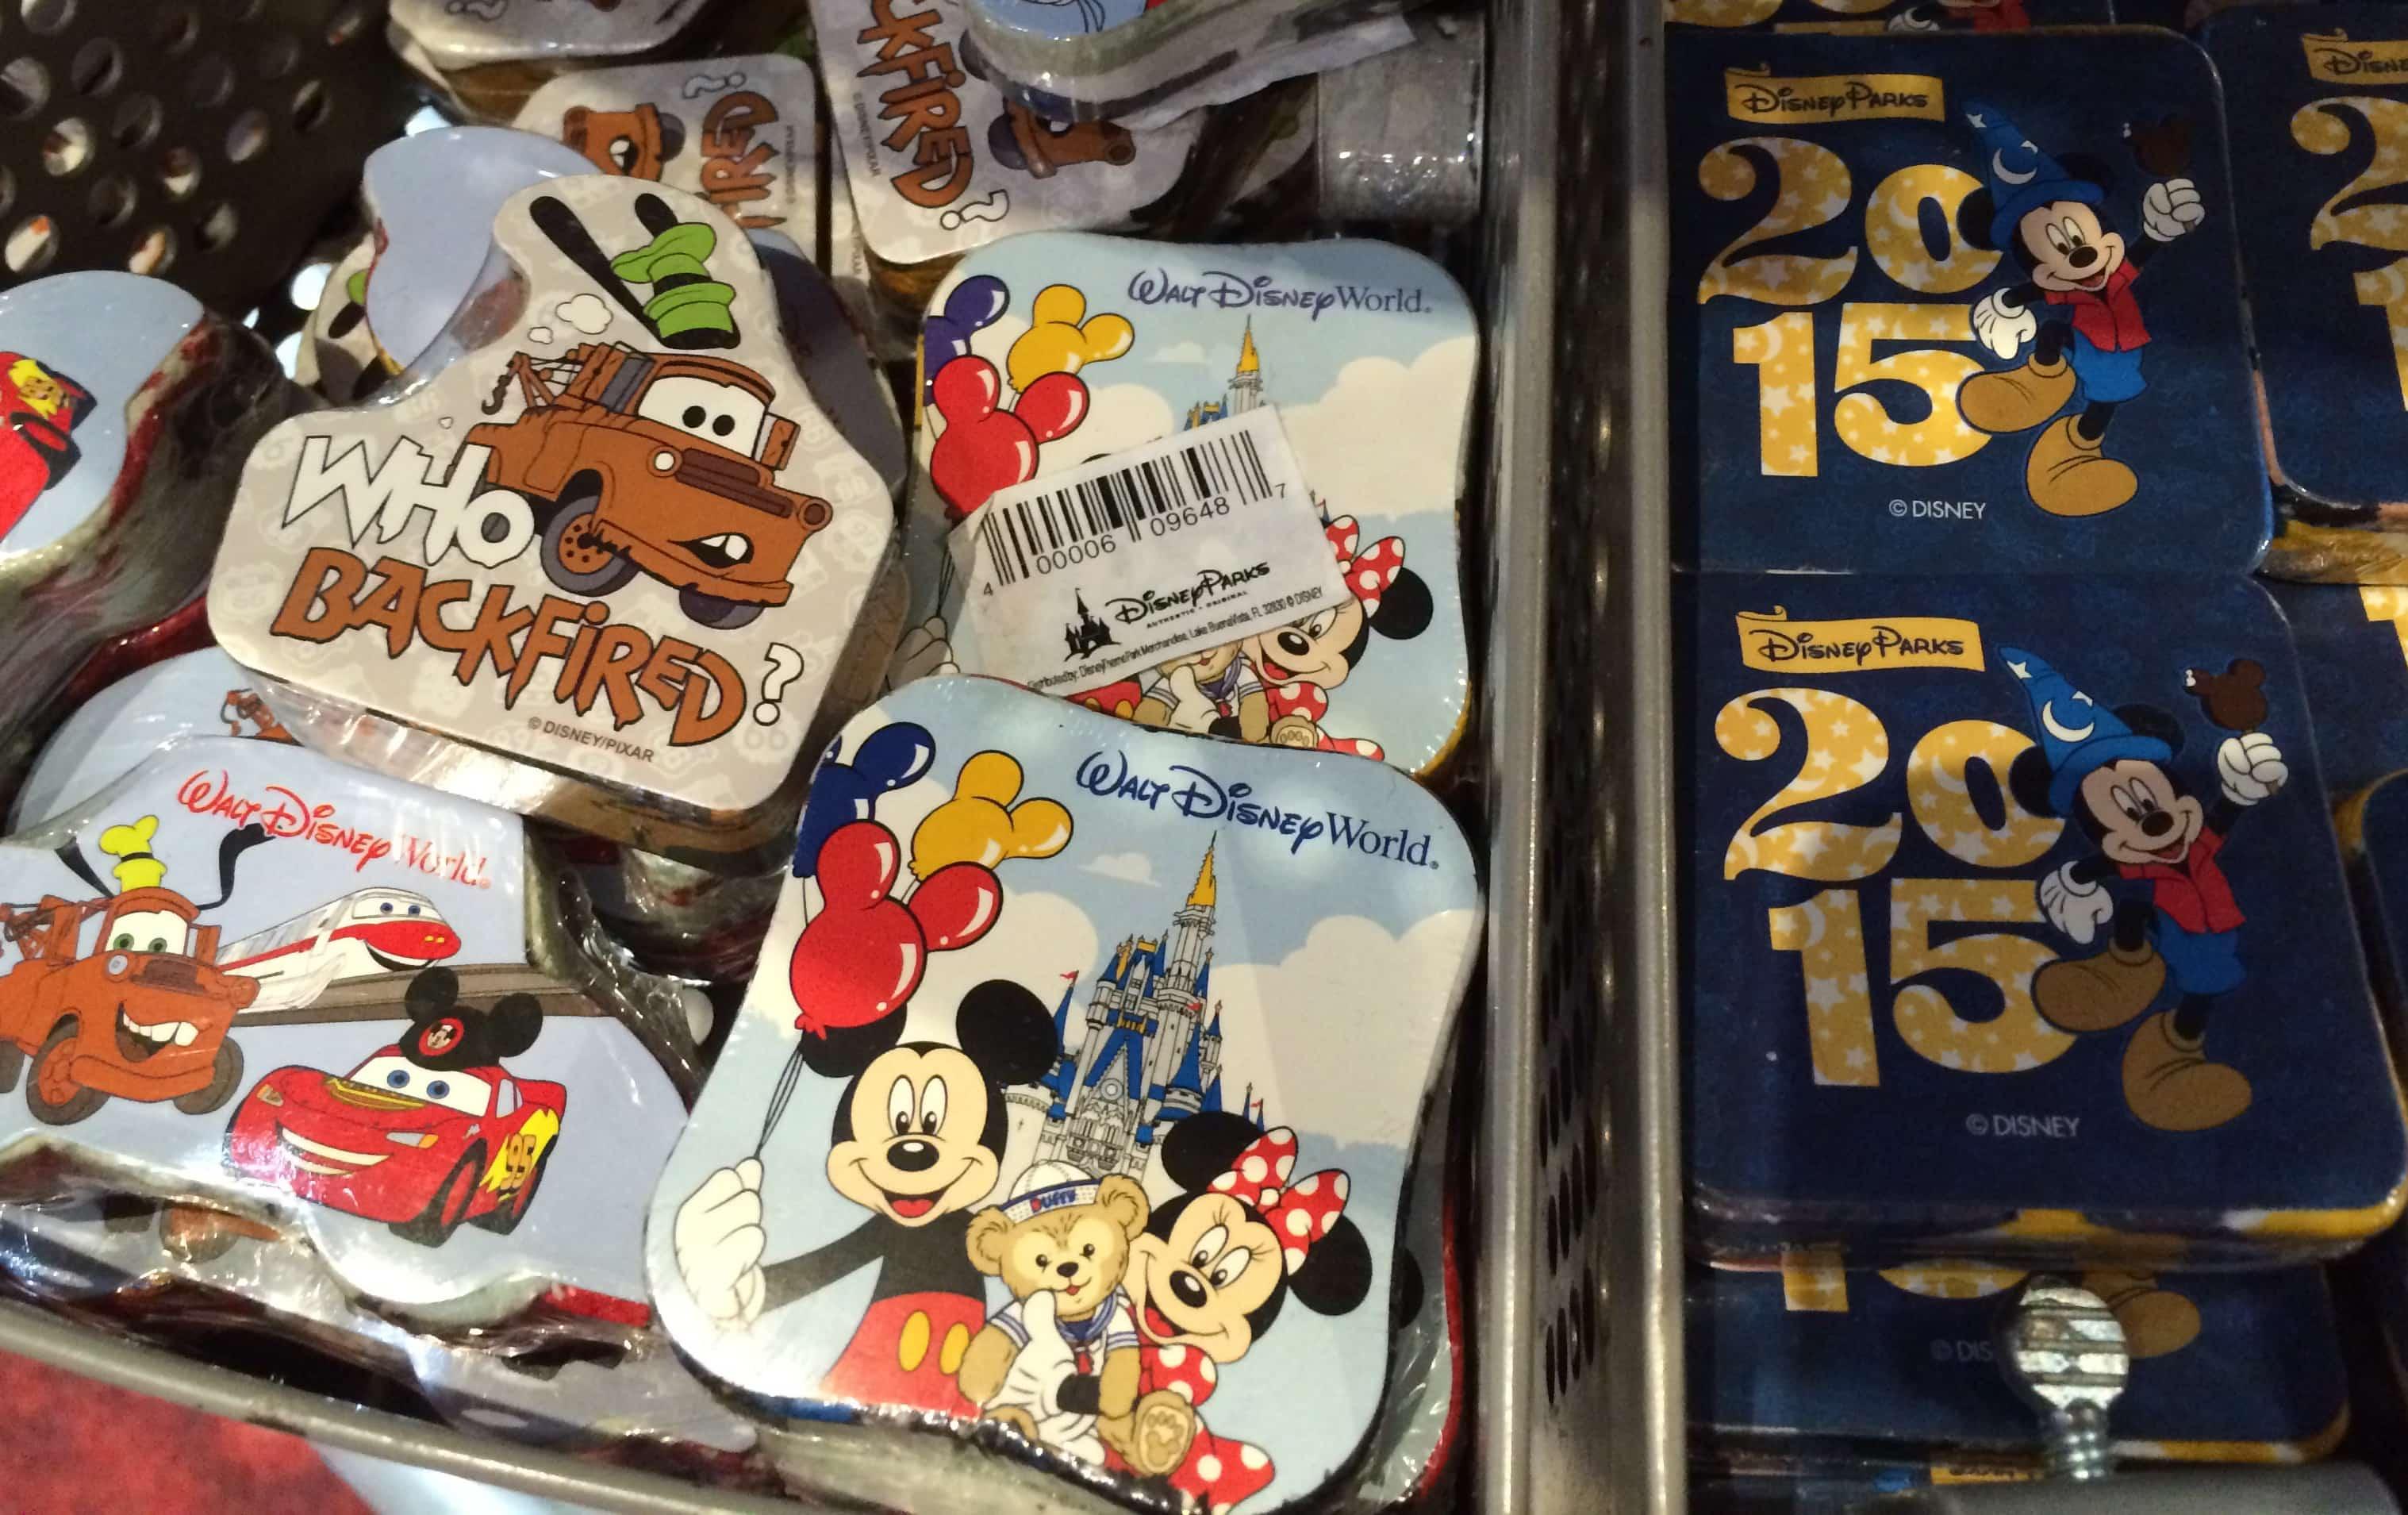 Bathroom Accessories 2015 disney bathroom accessories found at walt disney world resort